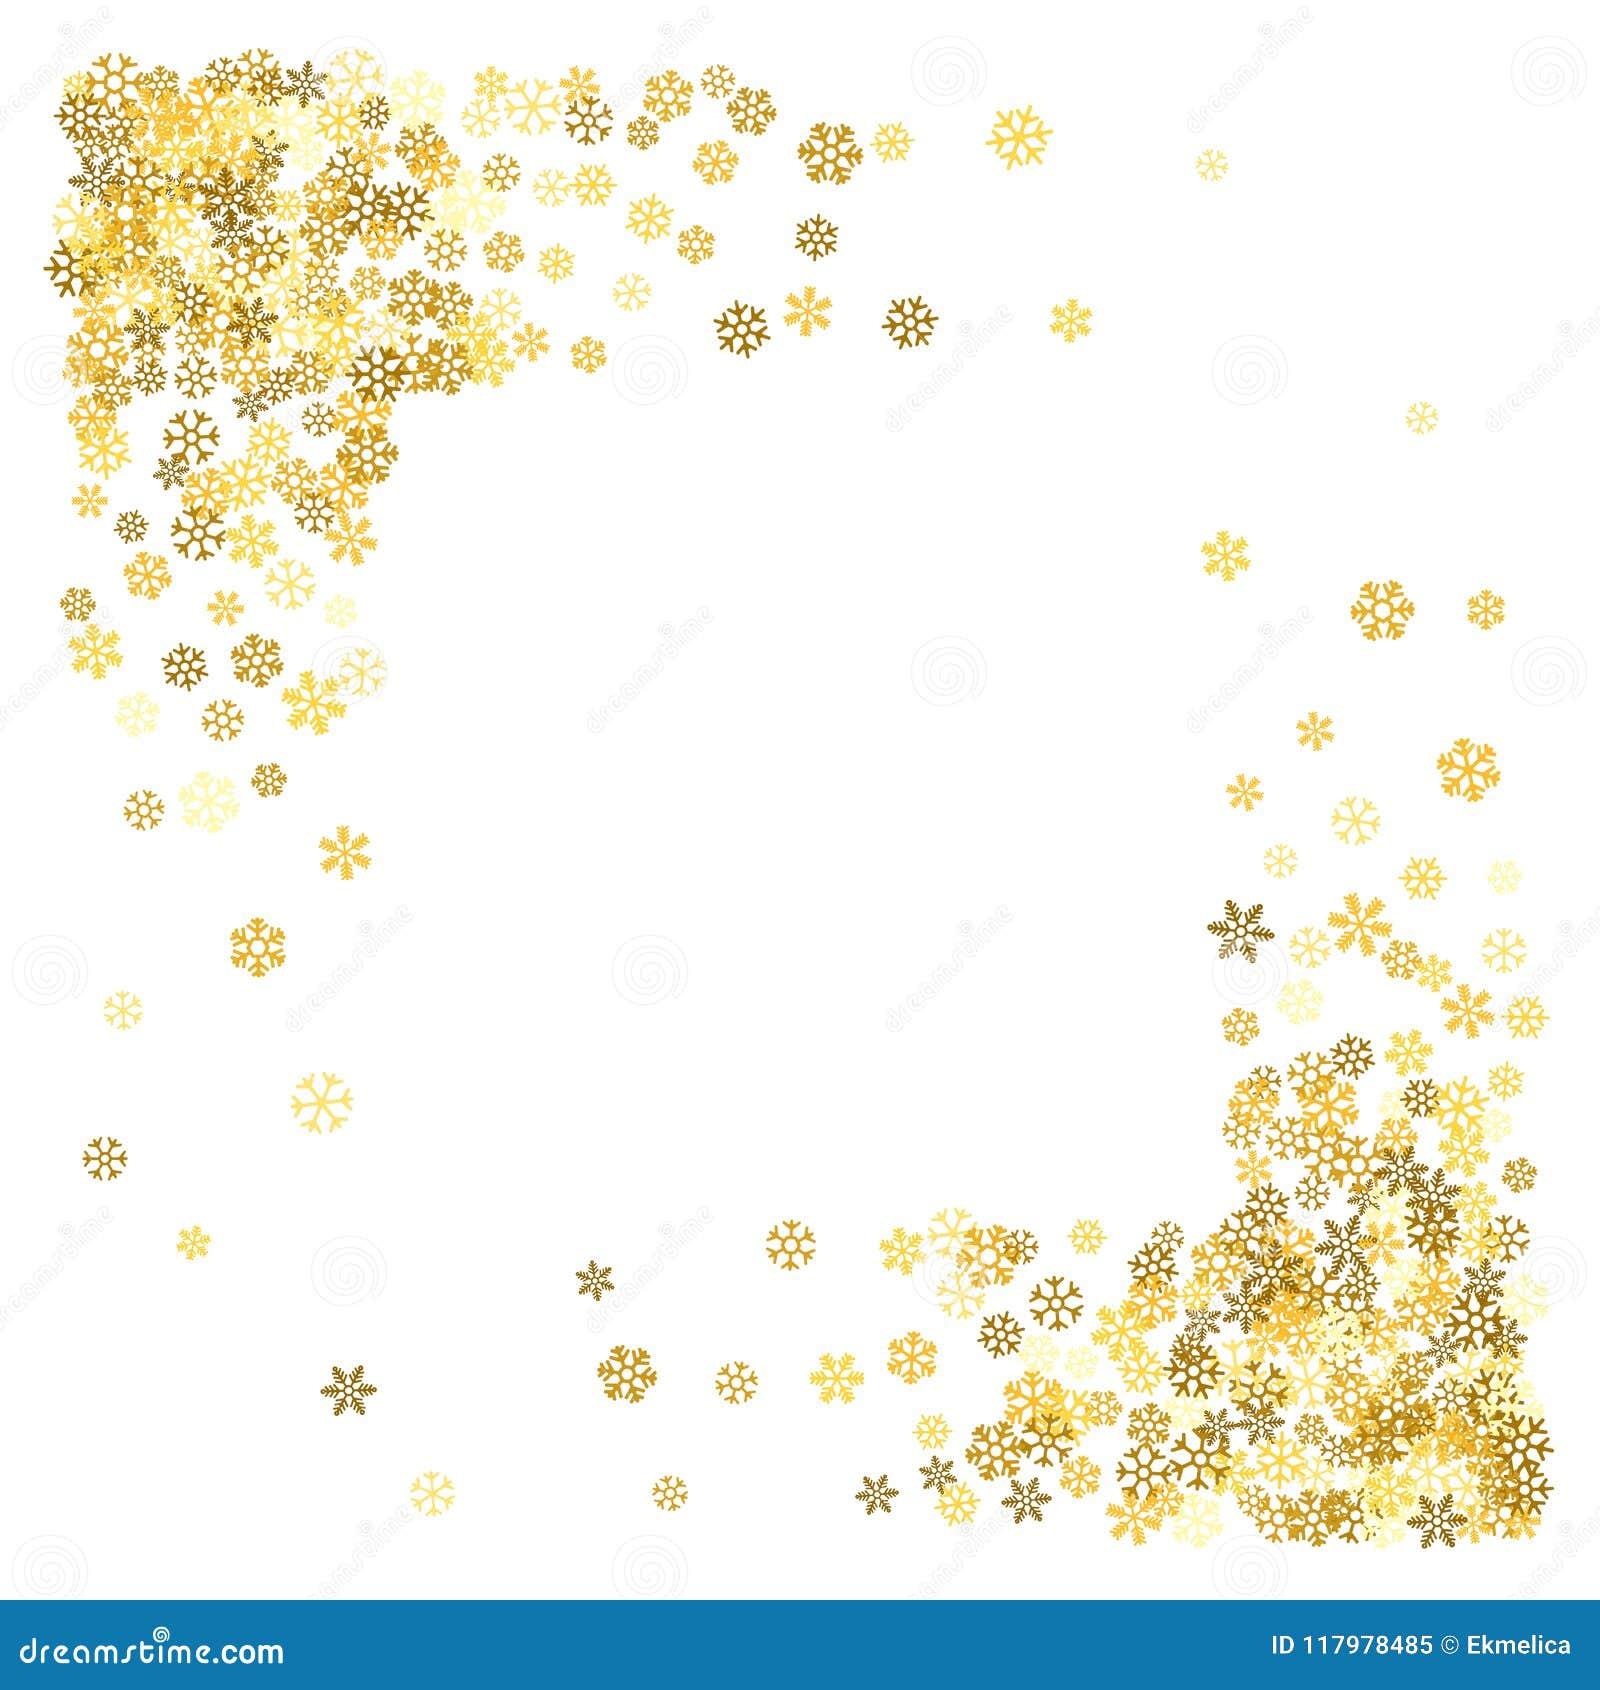 fed0b69df94 Square corner gold frame or border of scatter golden snowflakes on white  background. Design element for festive banner